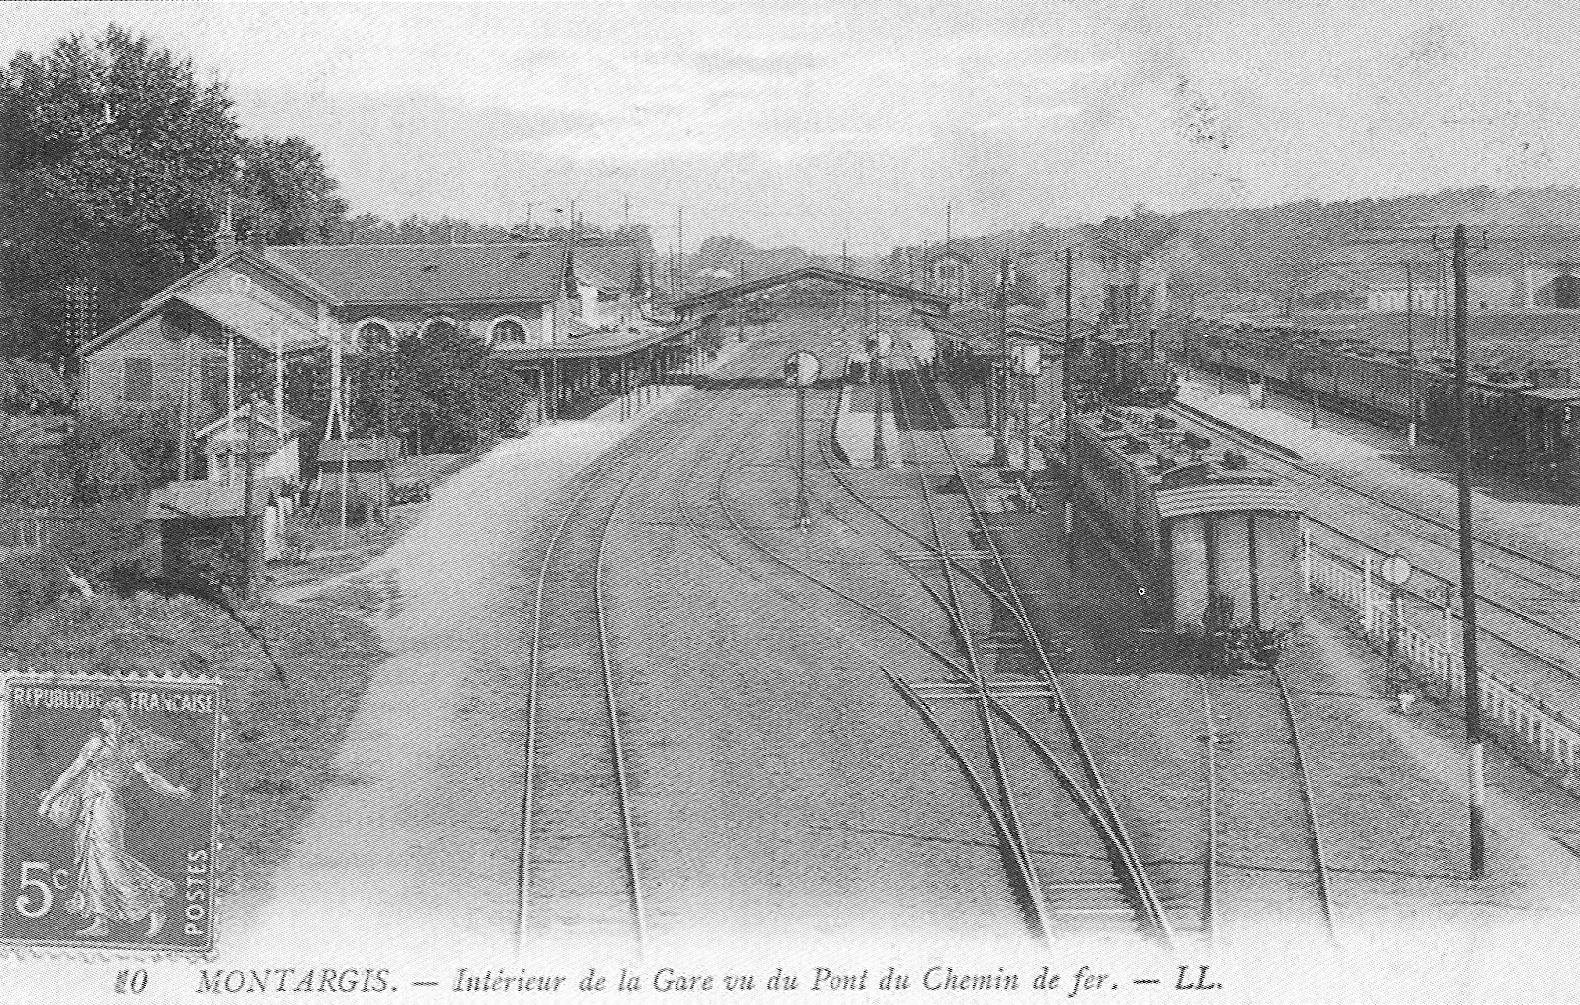 File:Gare-de-Montargis-Carte-Postale-3.jpg - Wikimedia Commons